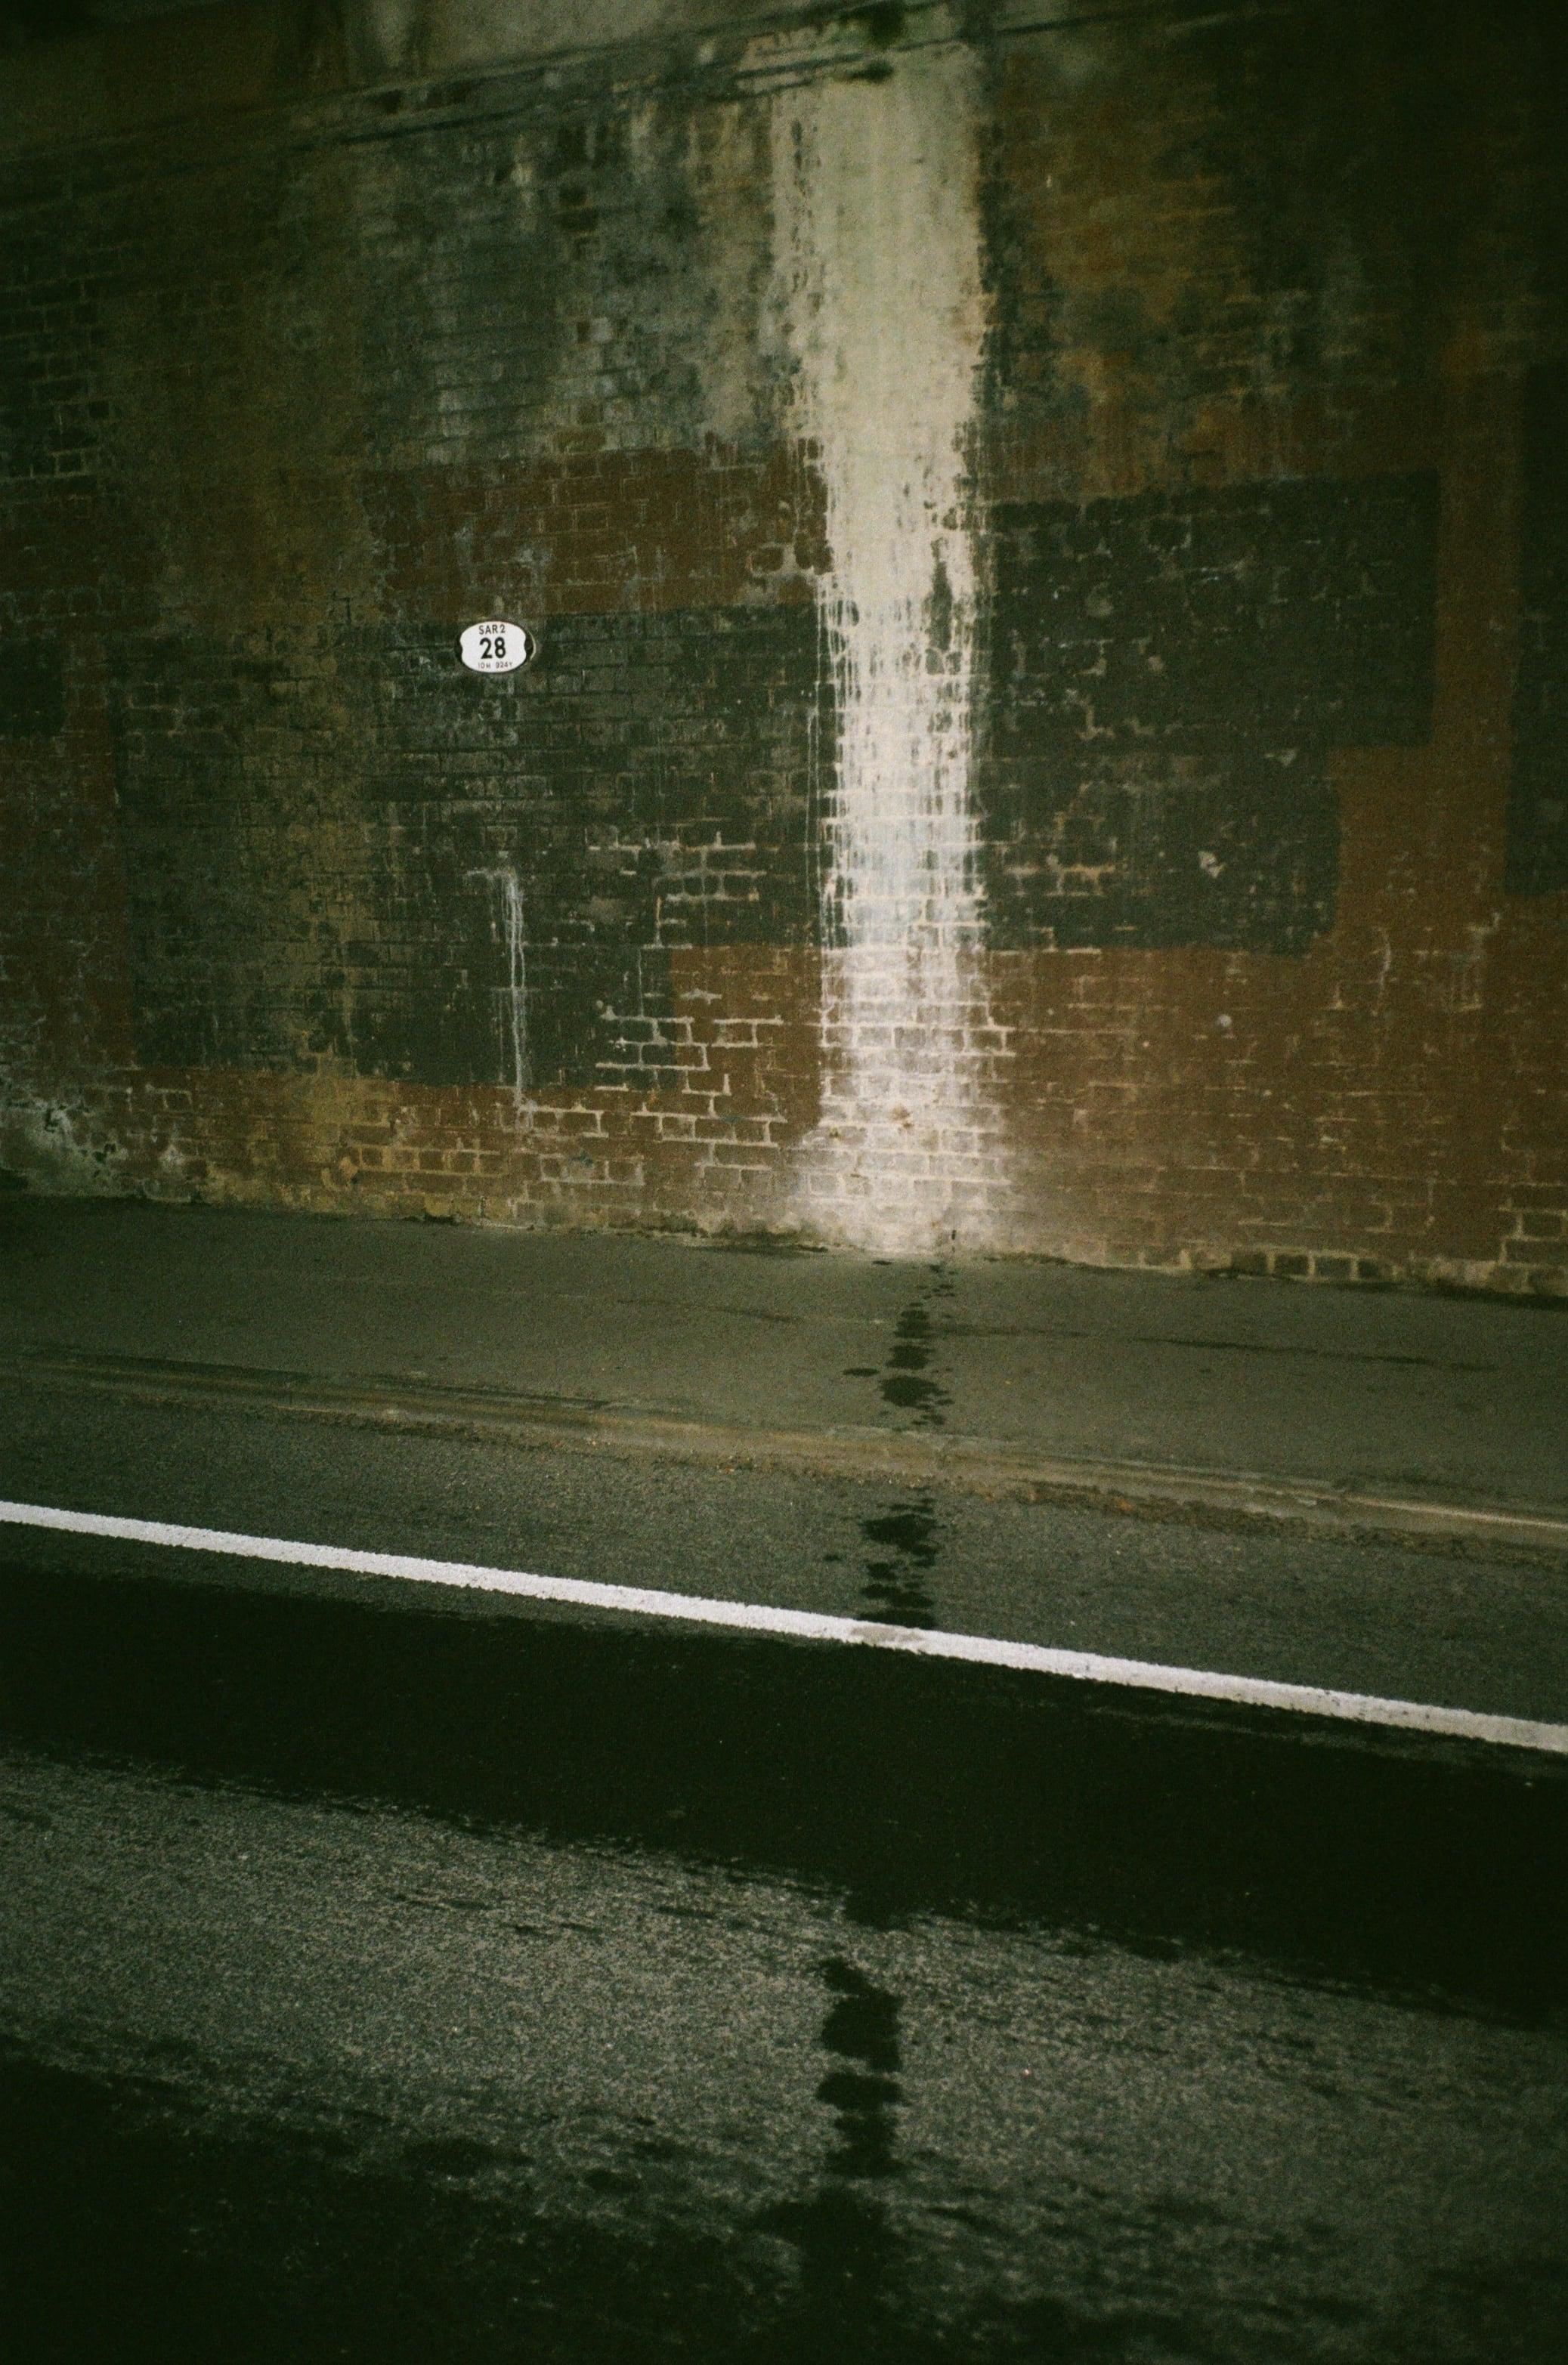 0029_28q_ChristosVourlis_photography_CVHAIR_CVDIARY_personal diary__film_35mm_photo.jpg